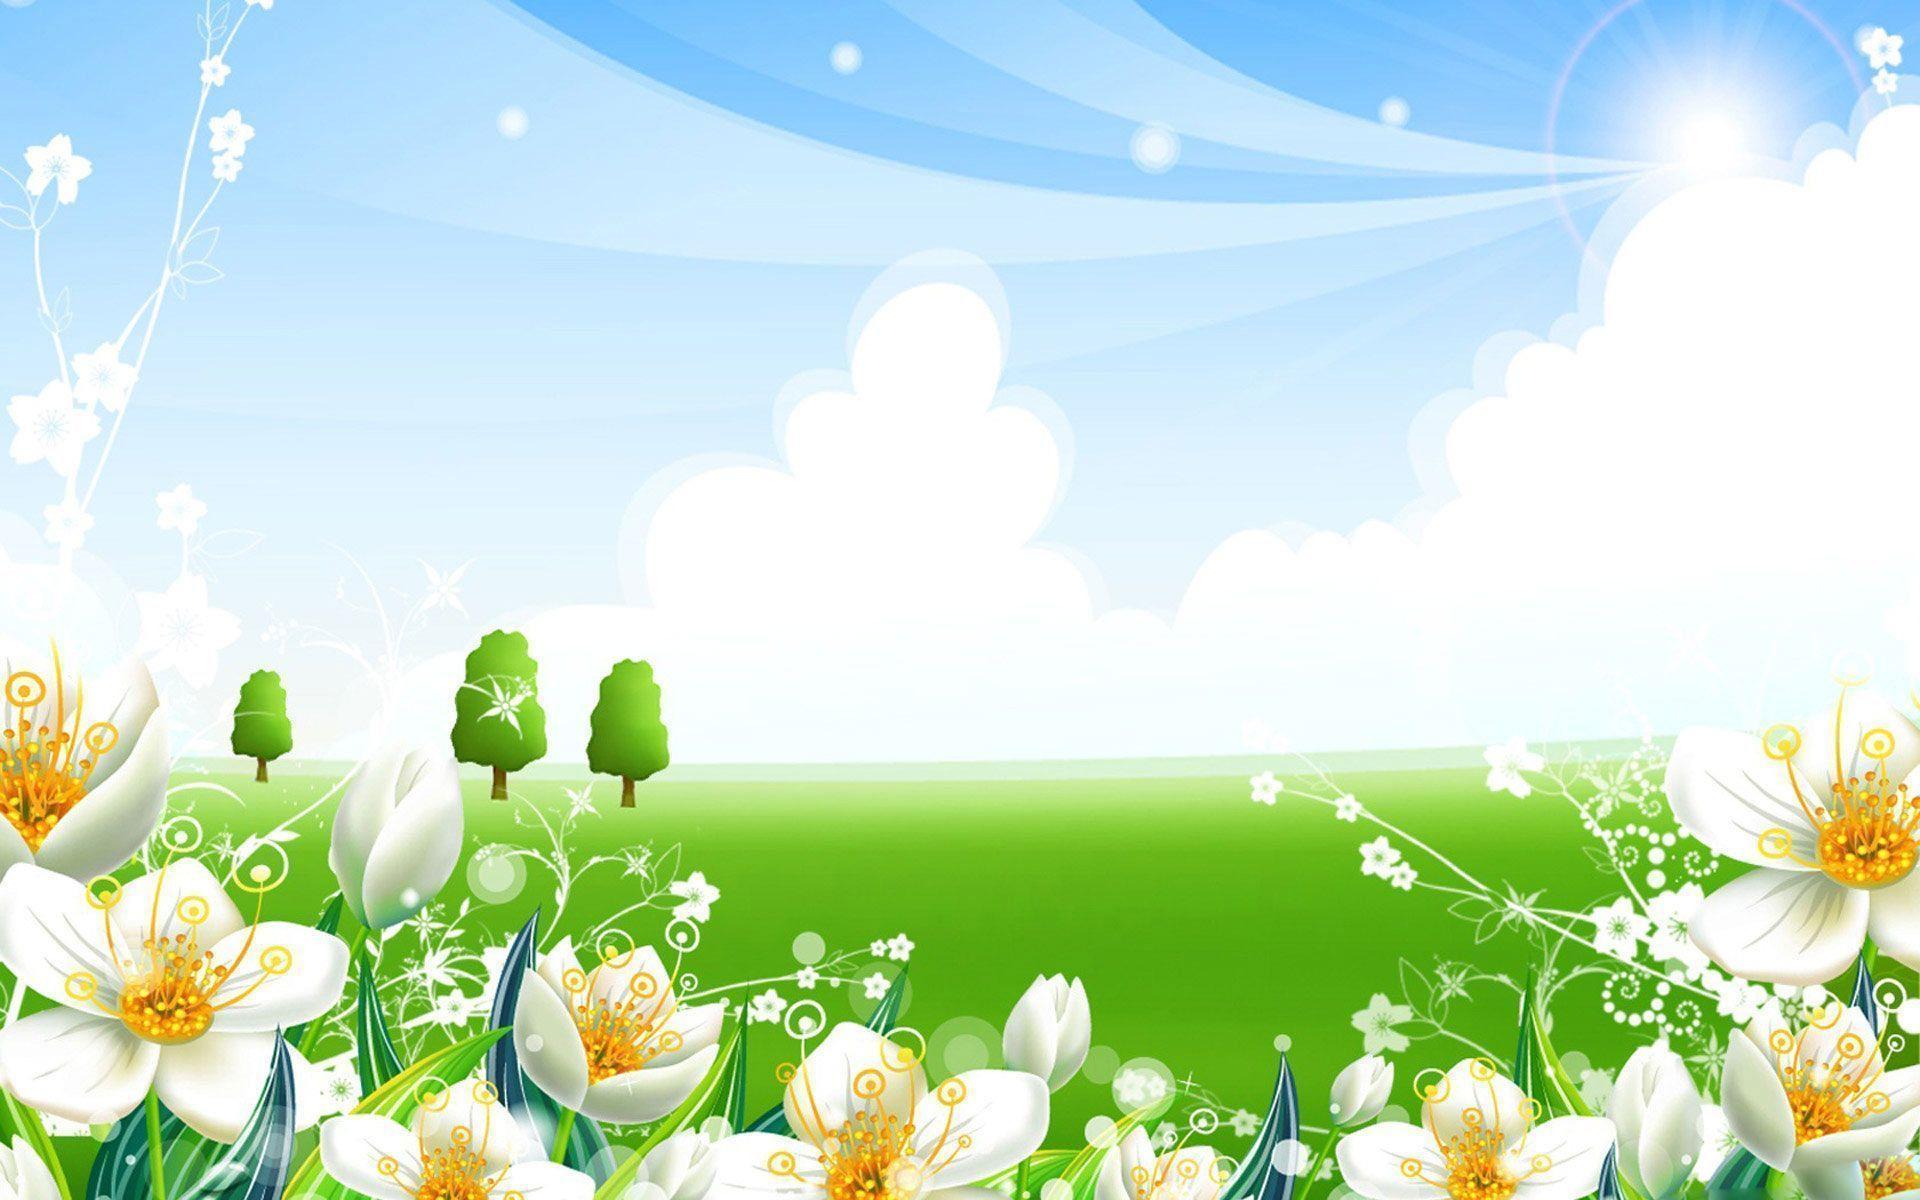 Wallpapers For Summer Flowers Wallpaper Desktop